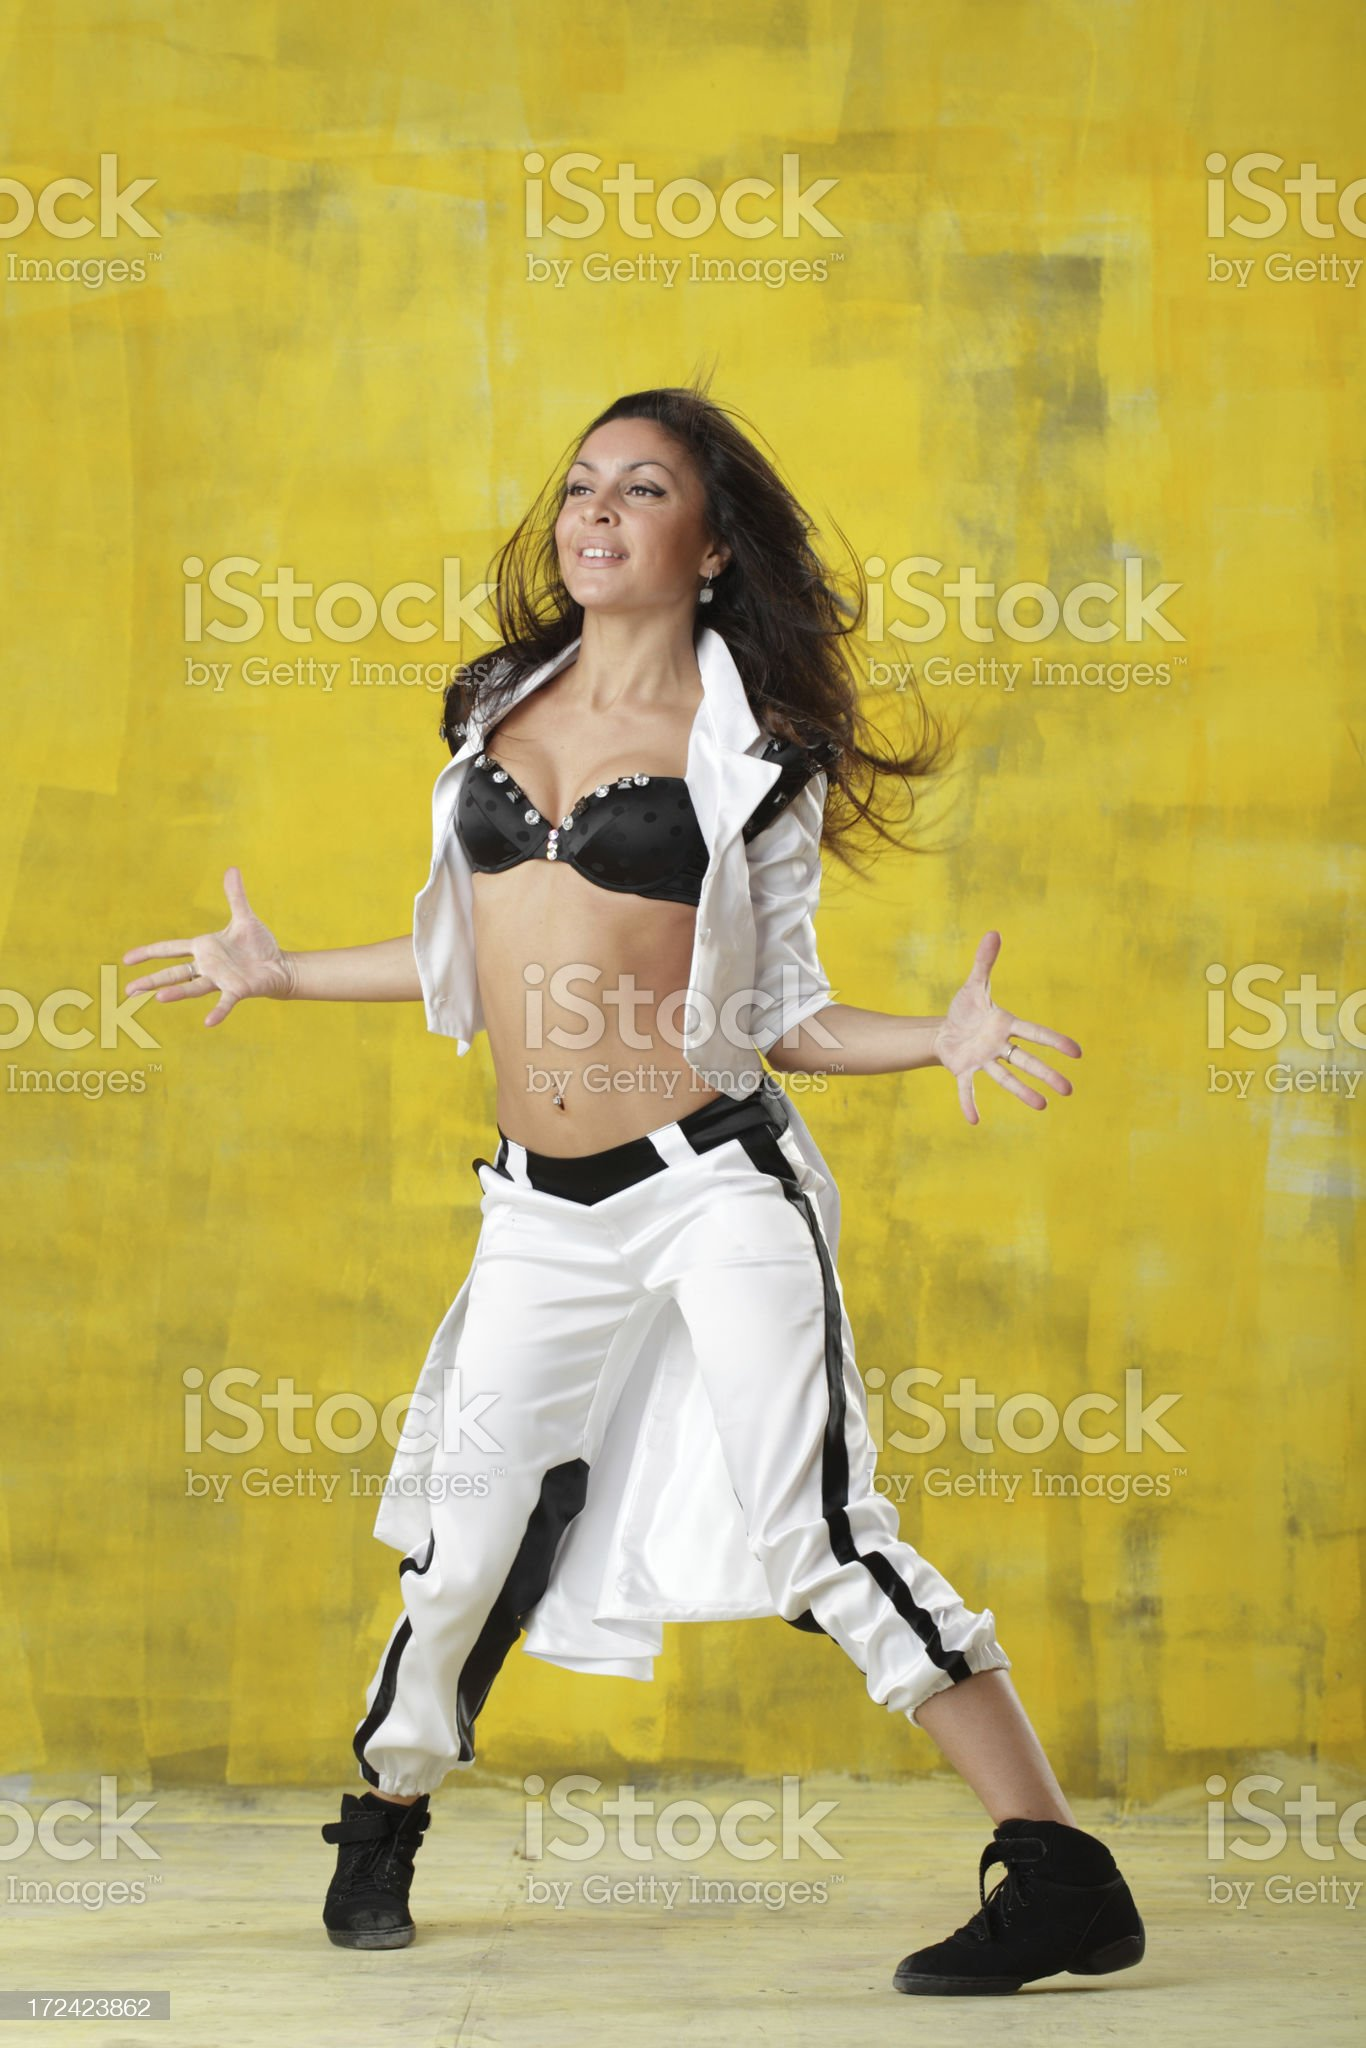 dancing modern dance royalty-free stock photo